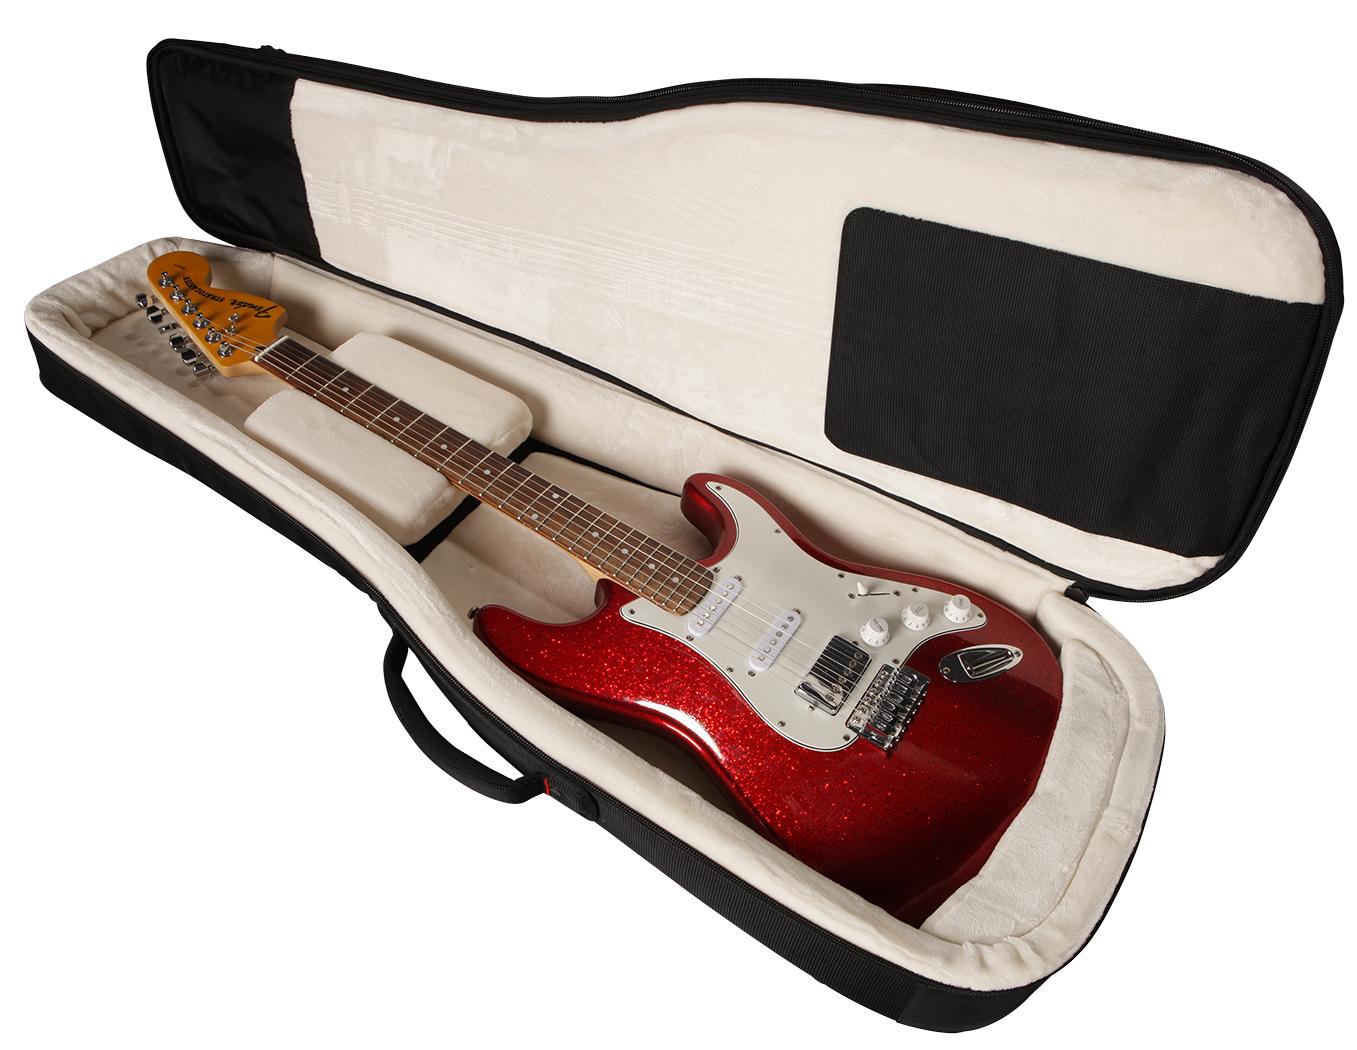 Best Guitar Gig Bag : gator pro go gig bags best gig bag ever musiciansbuy ~ Hamham.info Haus und Dekorationen